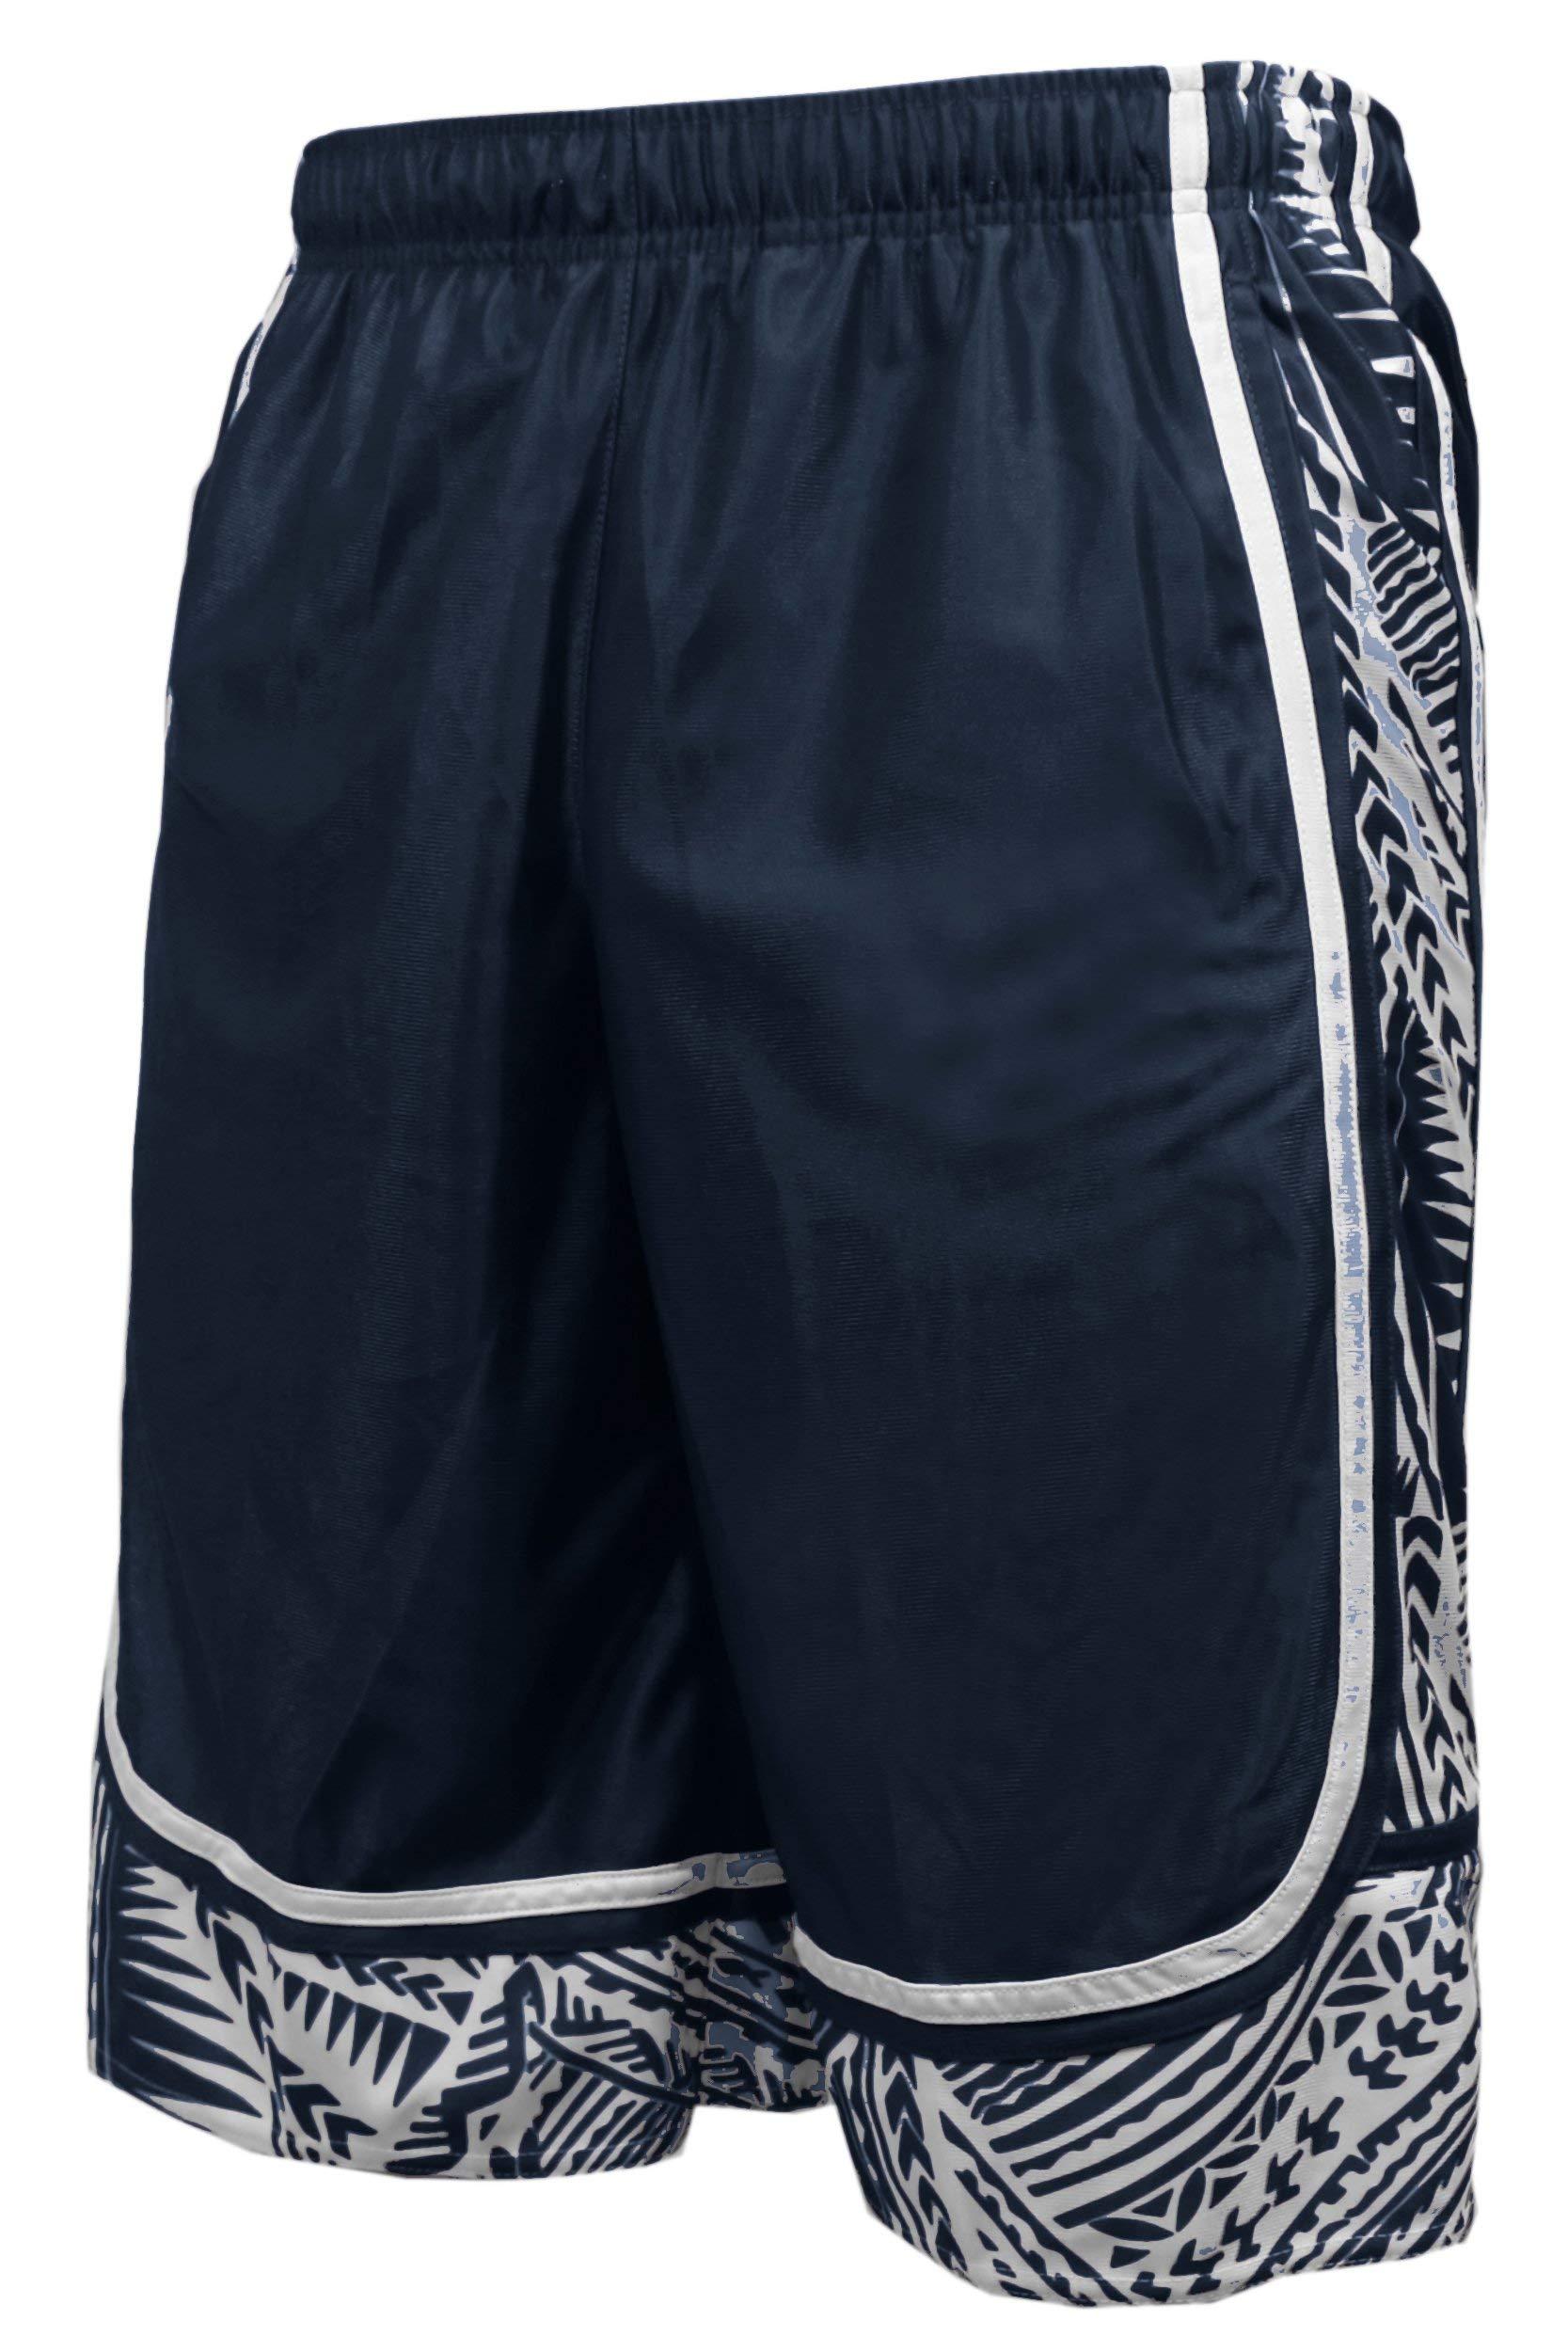 ViiViiKay Men's Long Dazzle Baseketball Training Workout Gym Athletic Shorts Printed_Navy 3XL